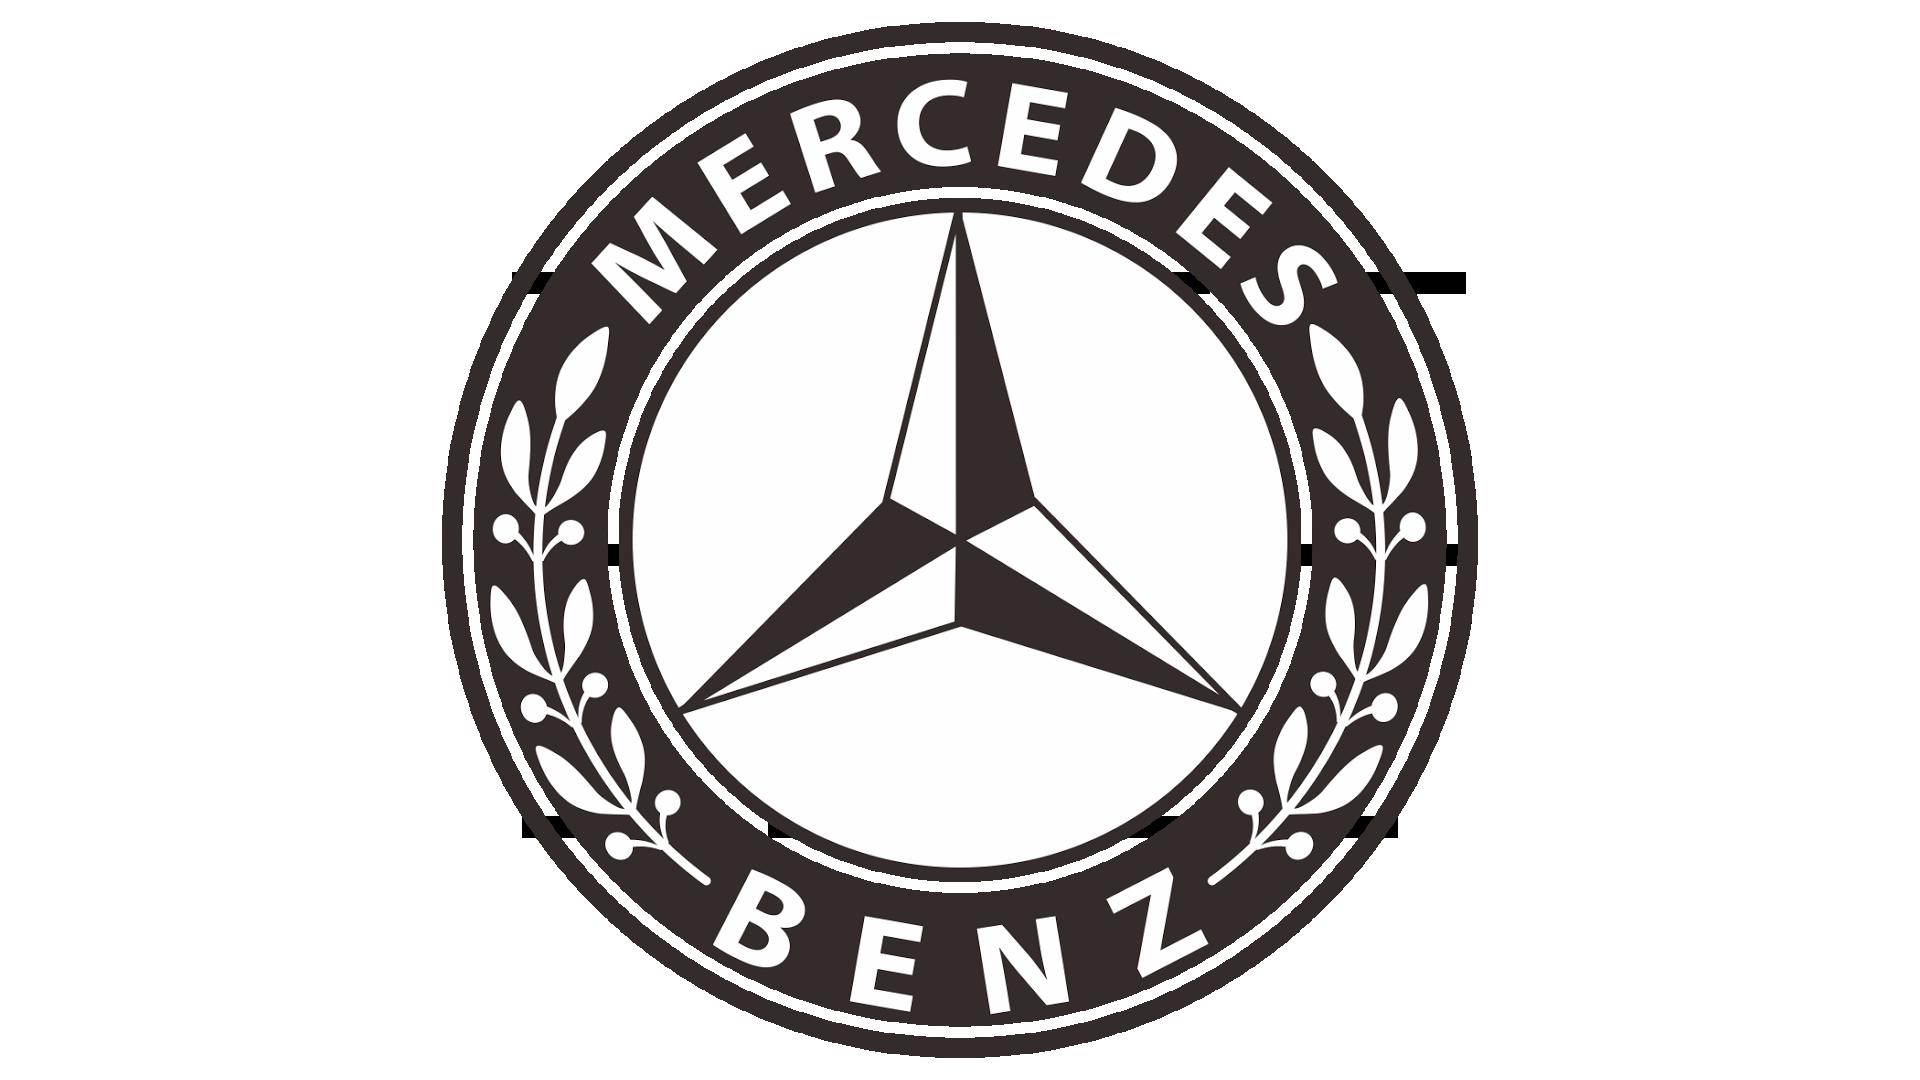 Mercedes me logo clipart transparent Mercedes logos PNG images free download transparent